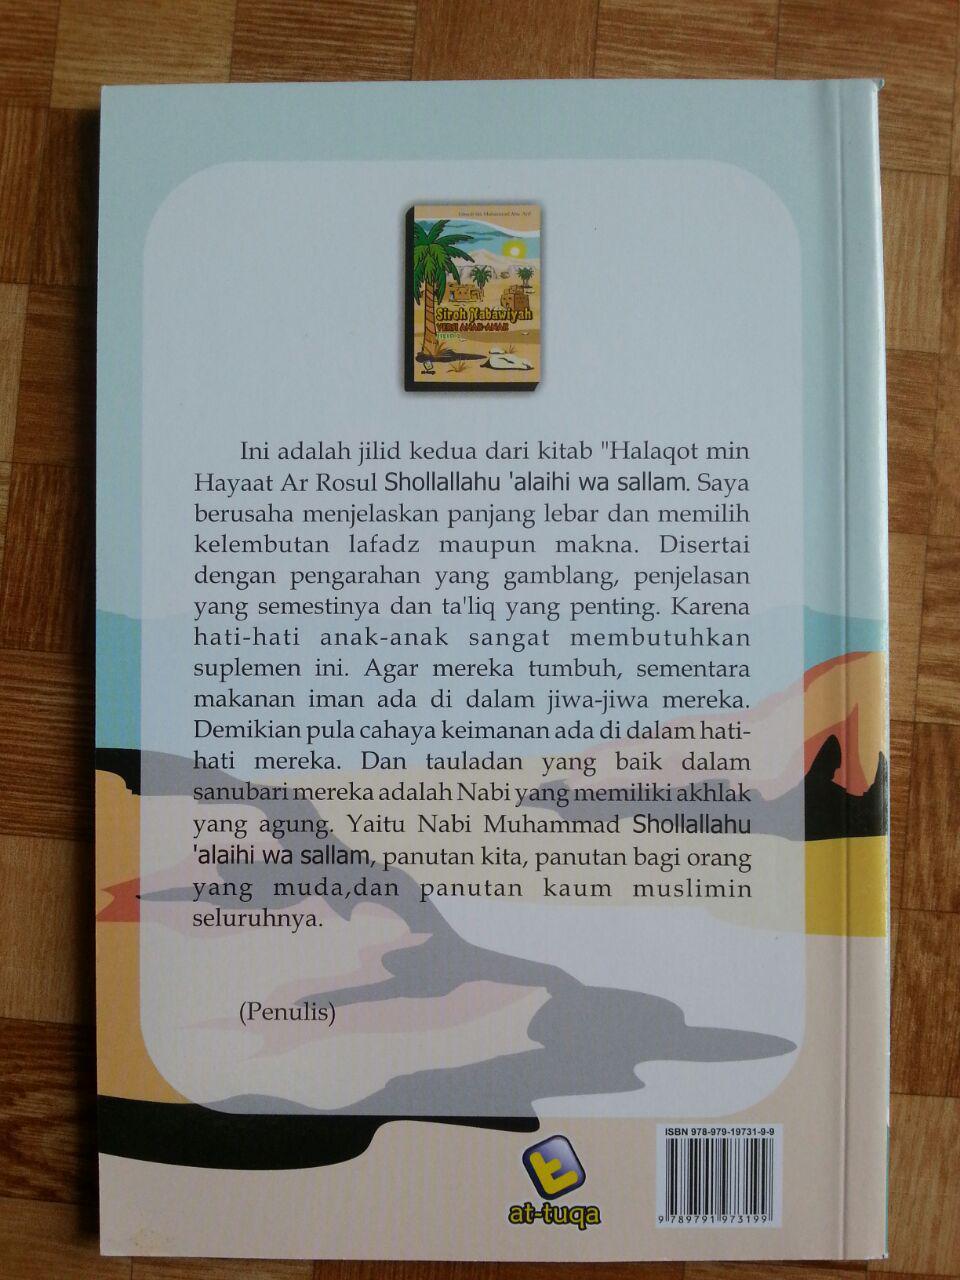 Buku Siroh Nabawiyah Versi Anak-Anak Jilid 2 cover